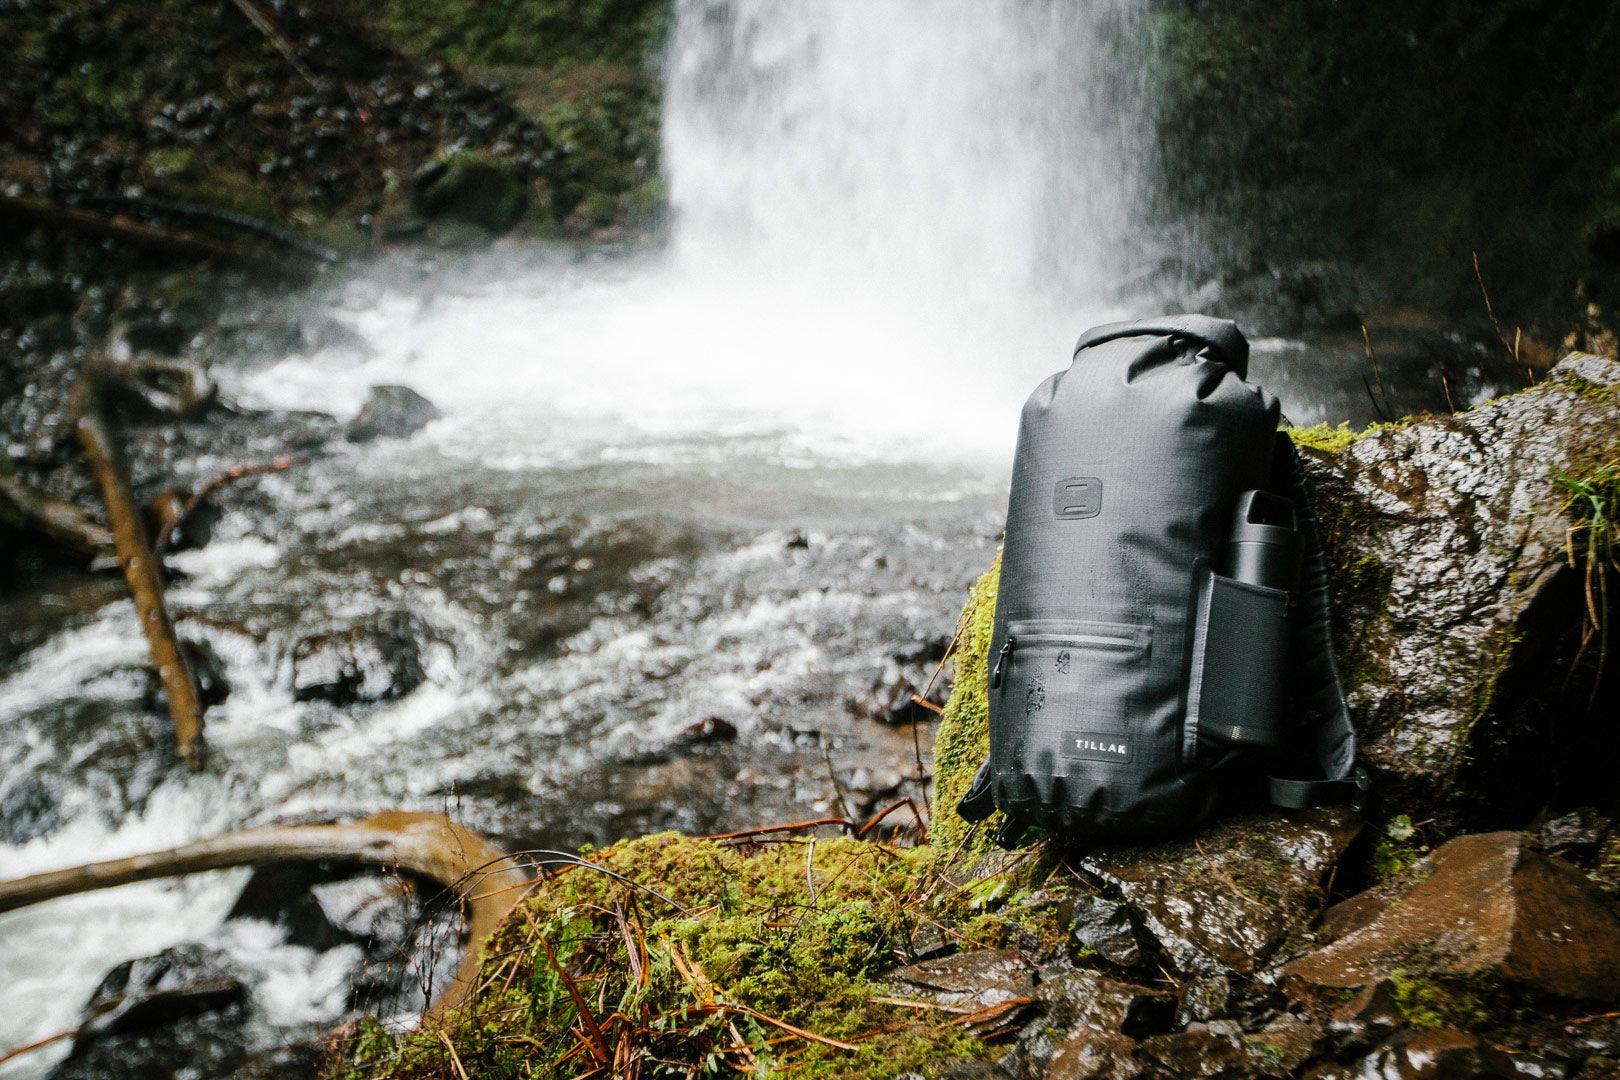 Tillak Kiwanda 20L Dry Bag Highlight